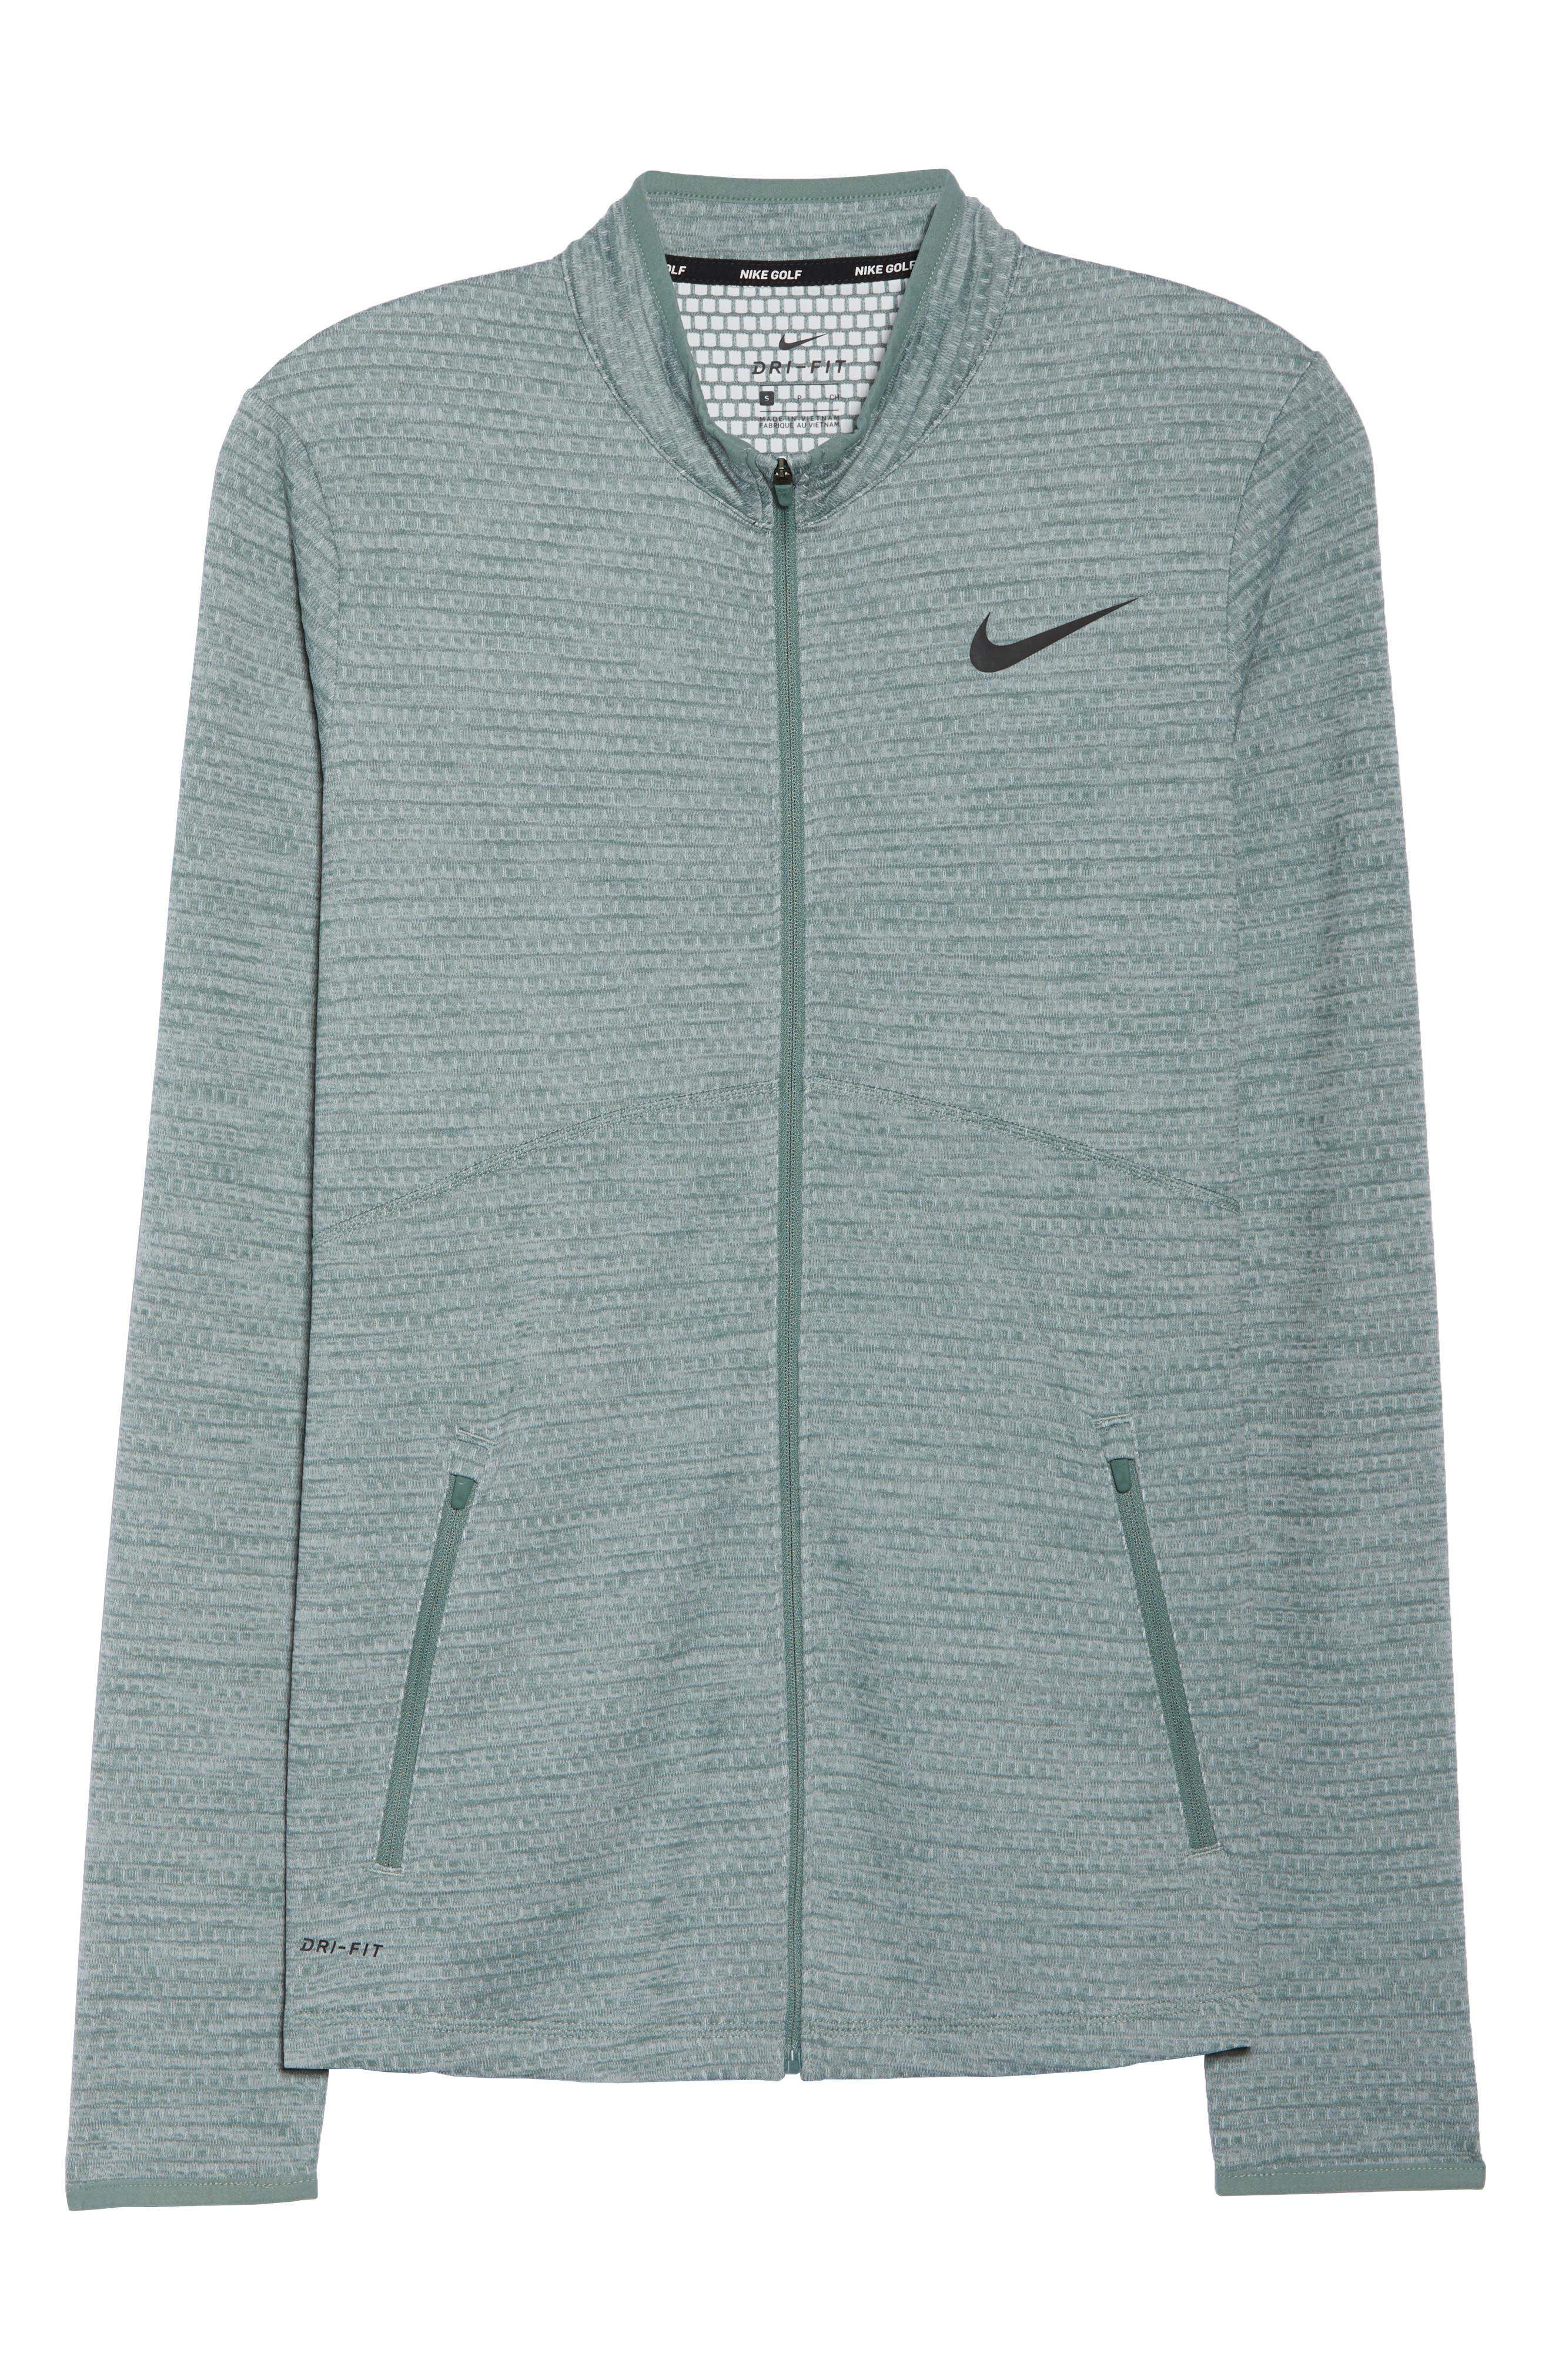 Dry Golf Jacket,                             Alternate thumbnail 7, color,                             Clay Green/ Black